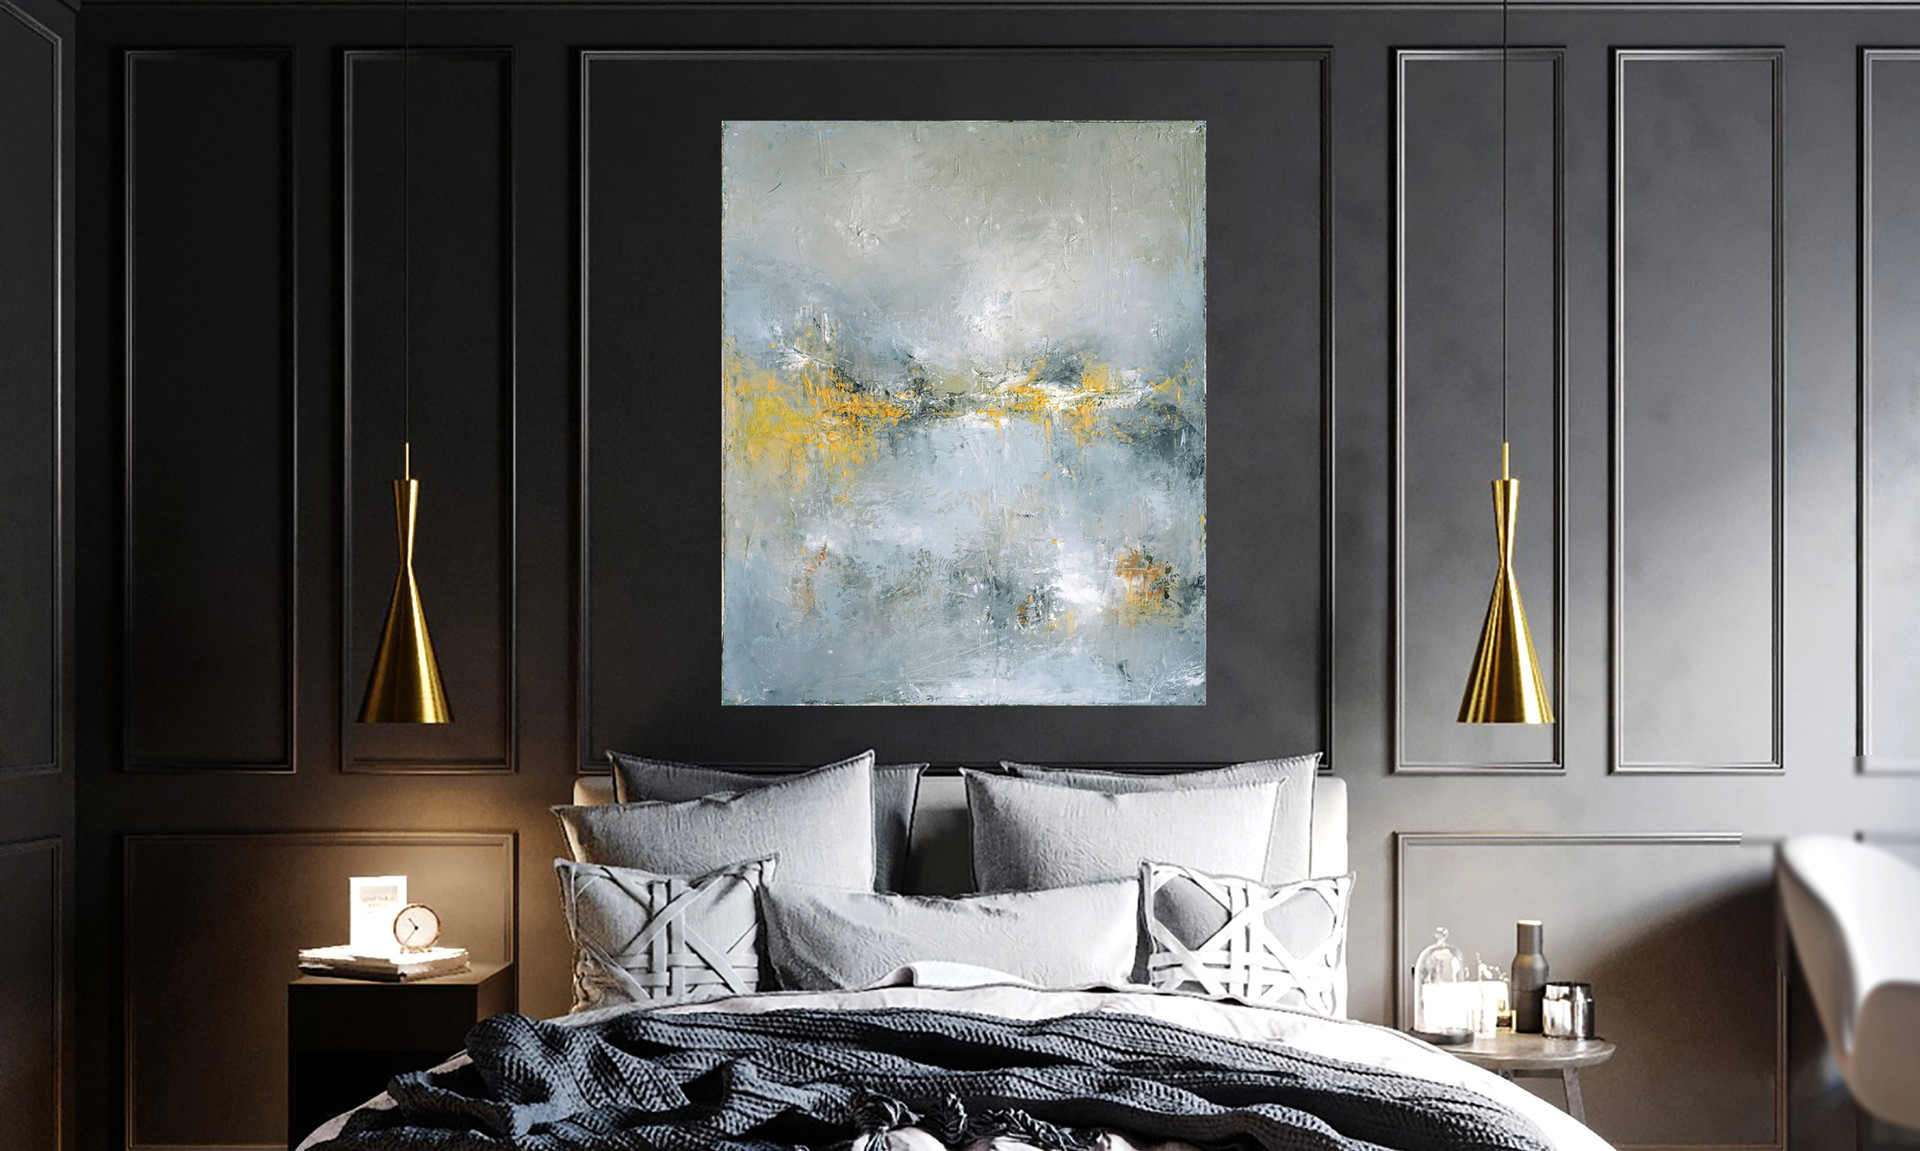 bea-palatinus-black-gold-painting-interi